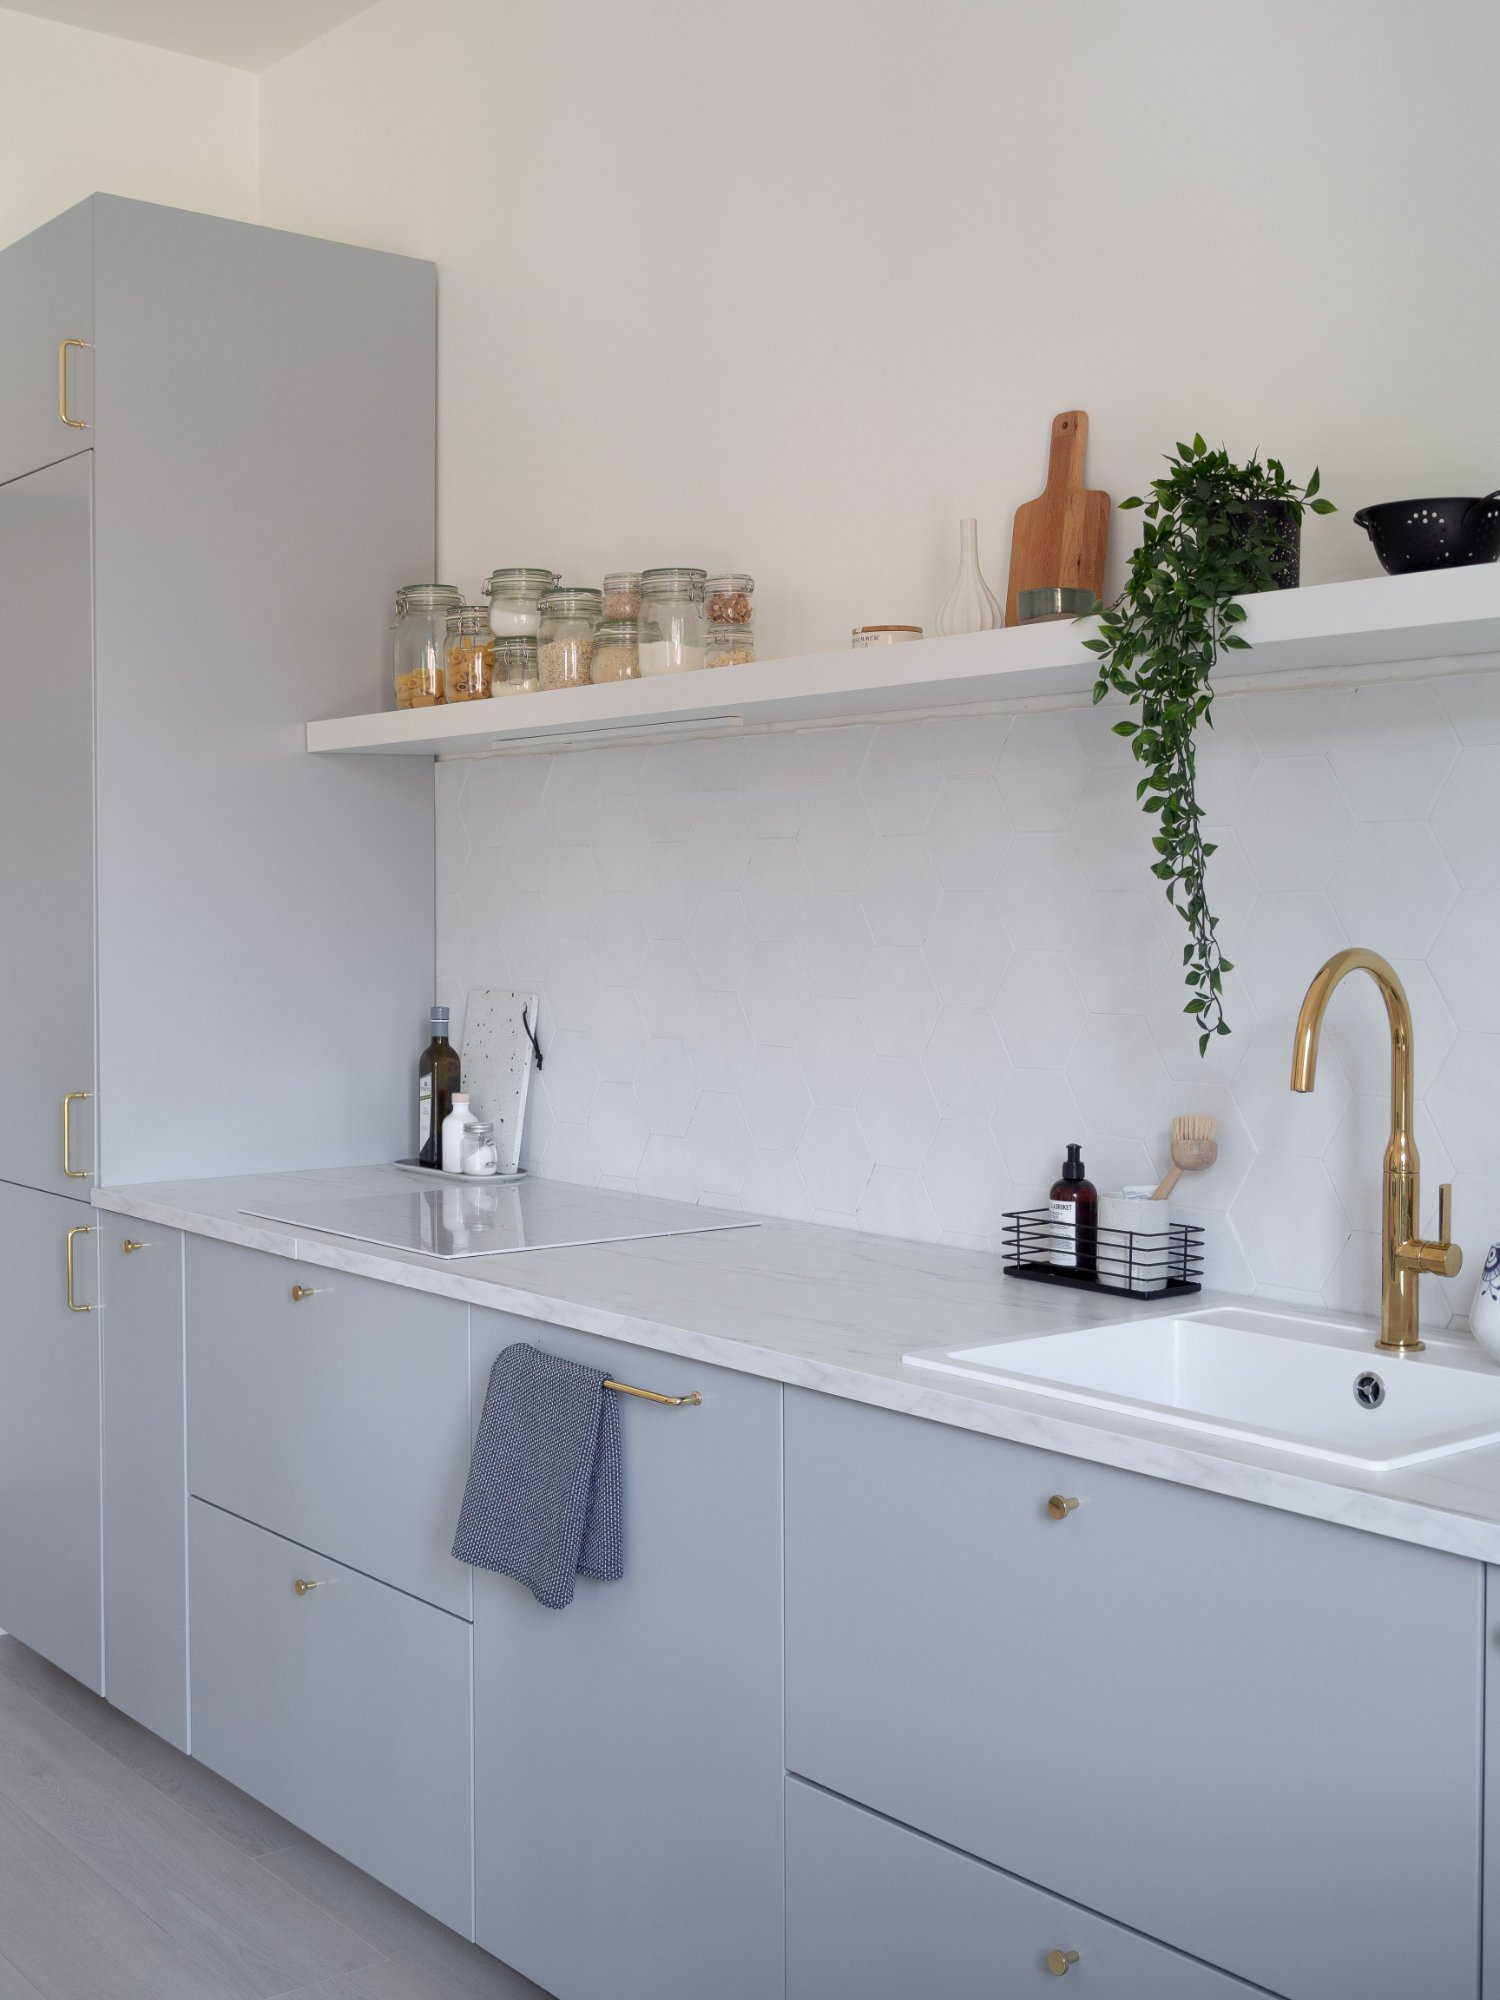 That Scandinavian Feeling Home Tour kitchen shelf